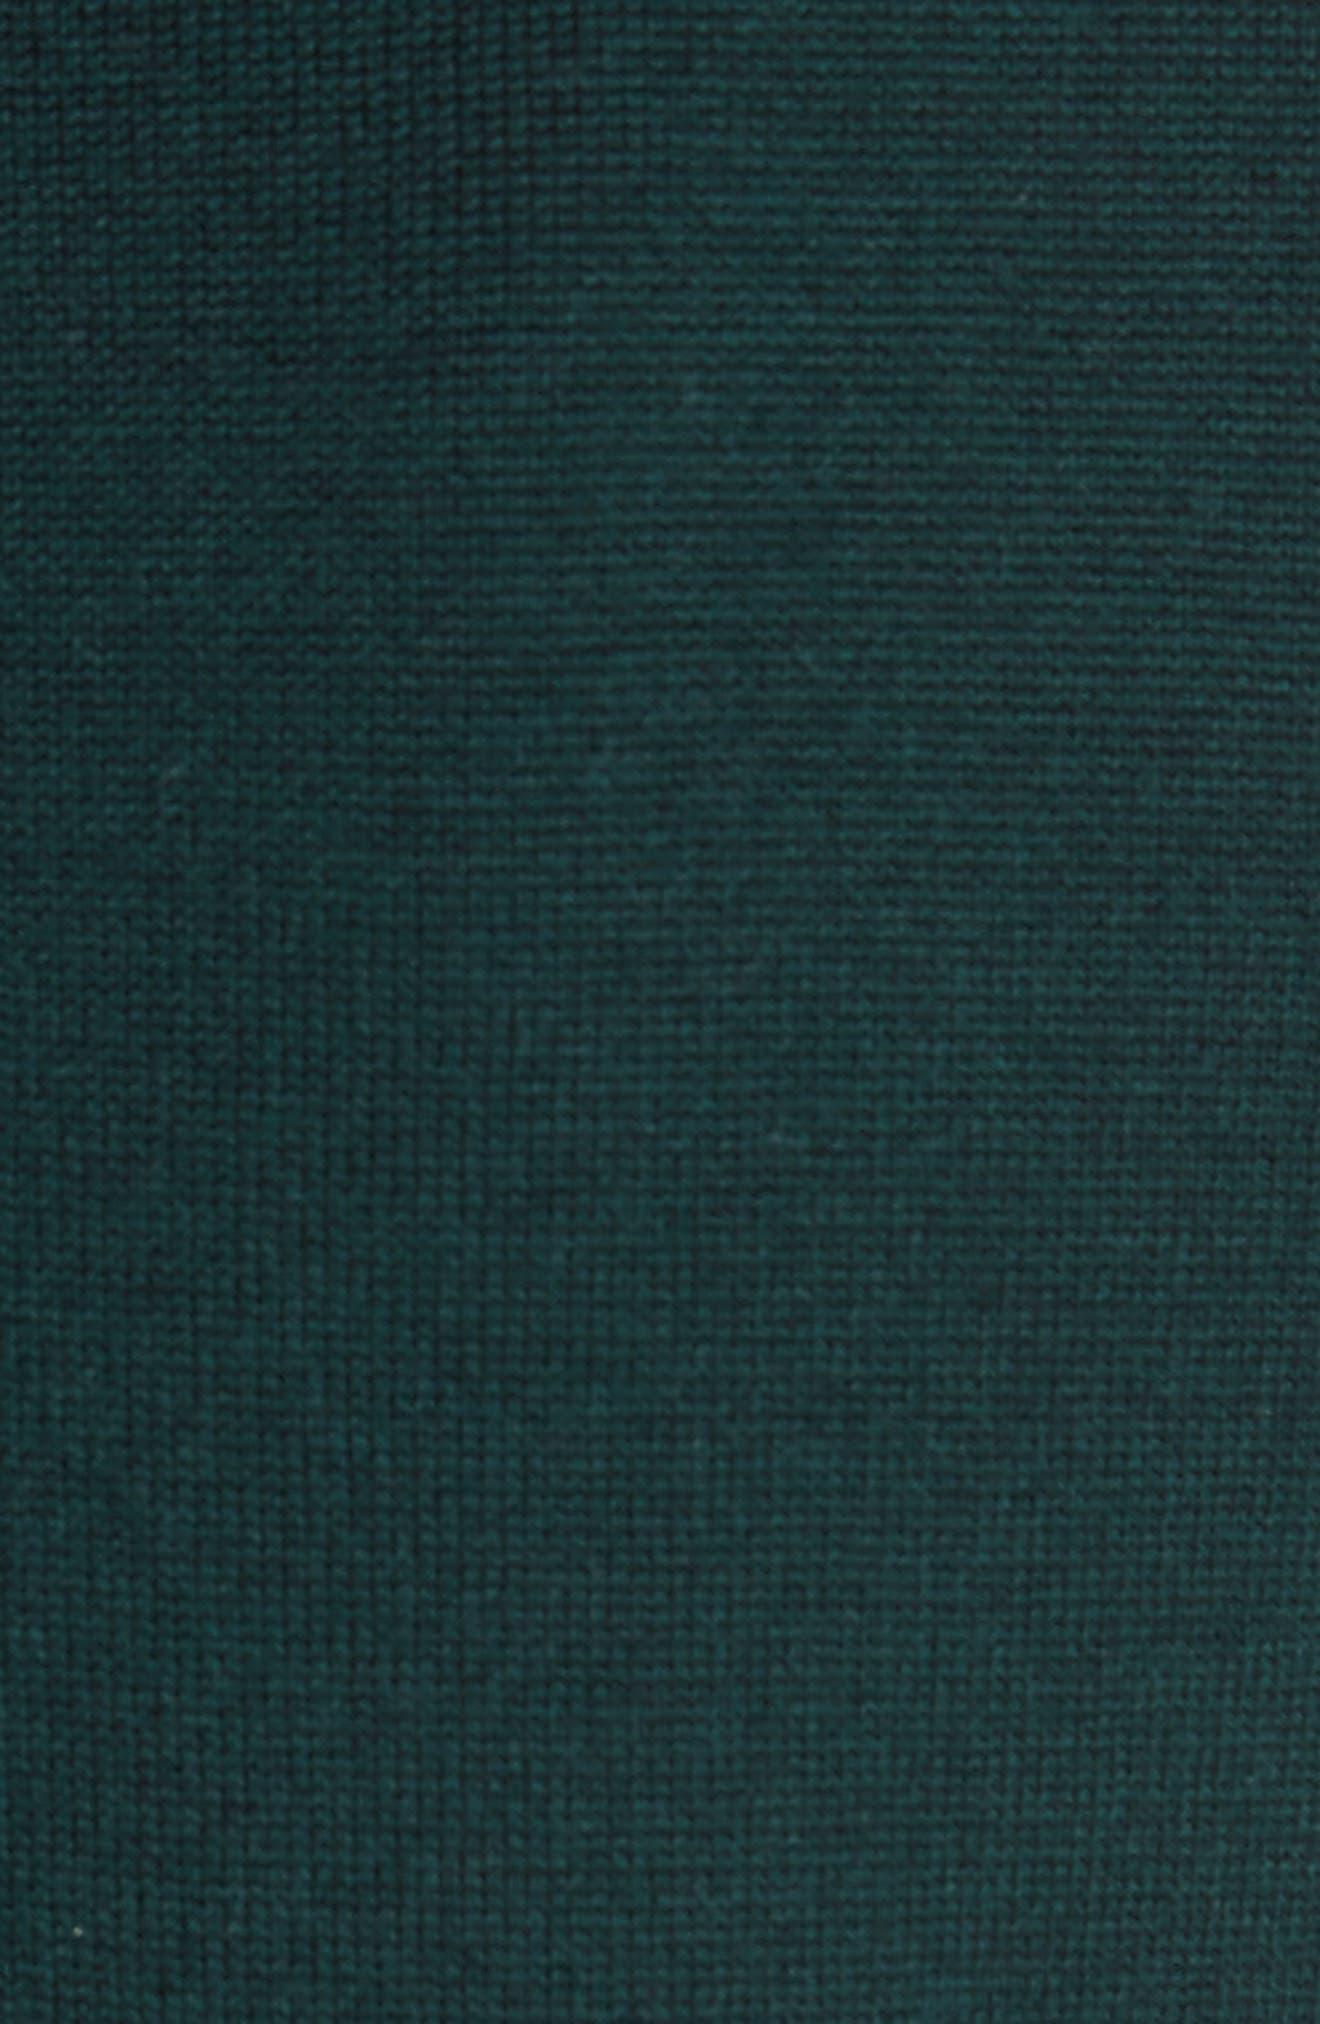 Reversible Knit Asymmetrical Top,                             Alternate thumbnail 6, color,